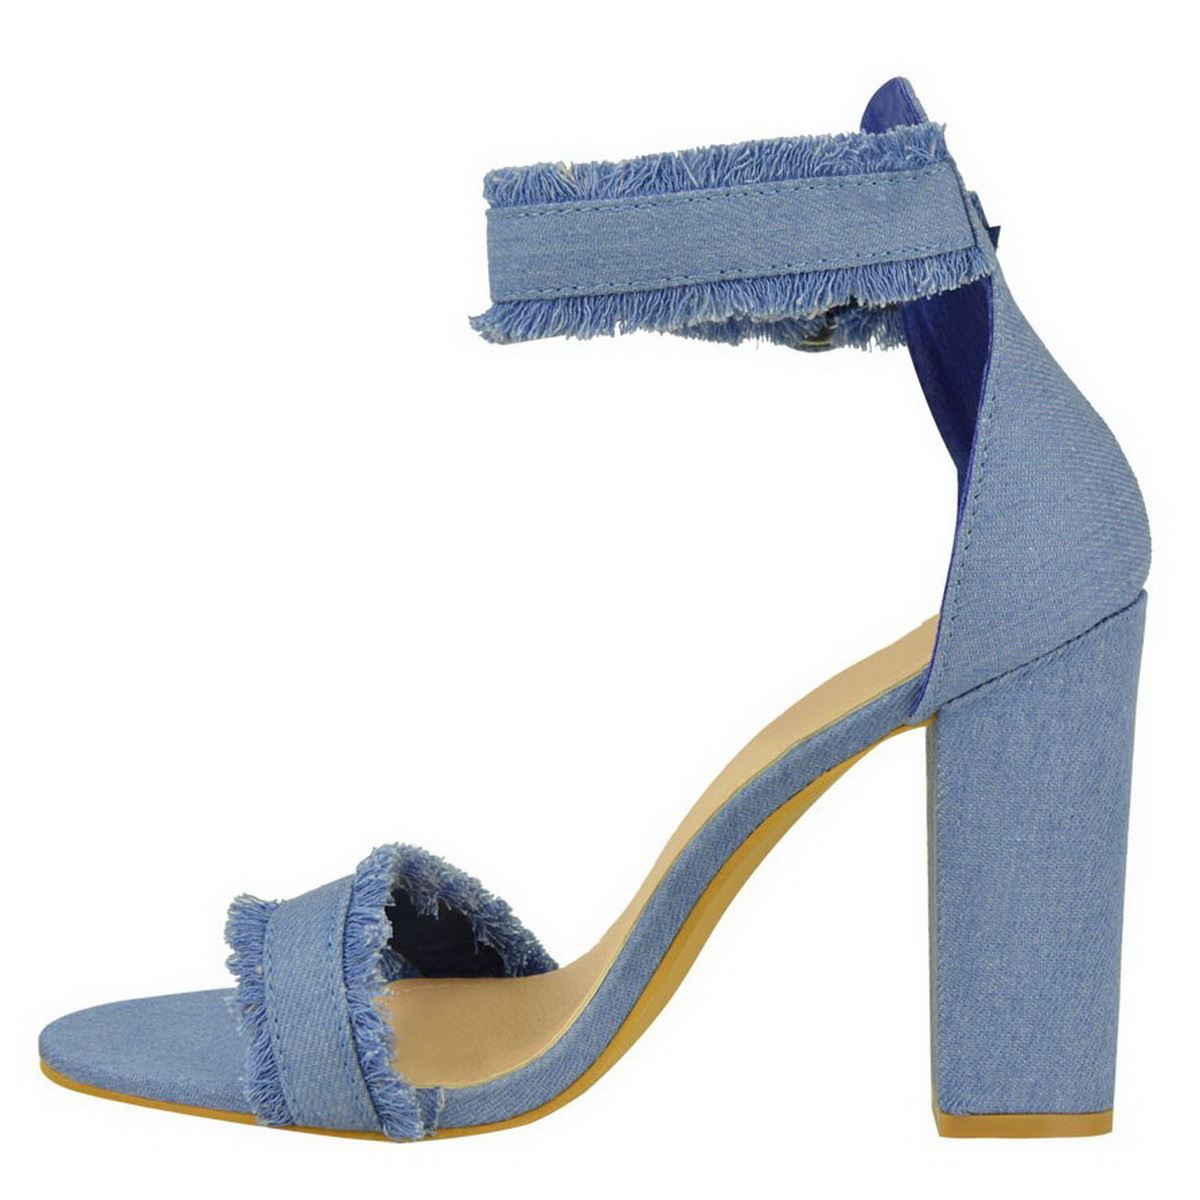 Ladies Ankle Strap Shoes Size